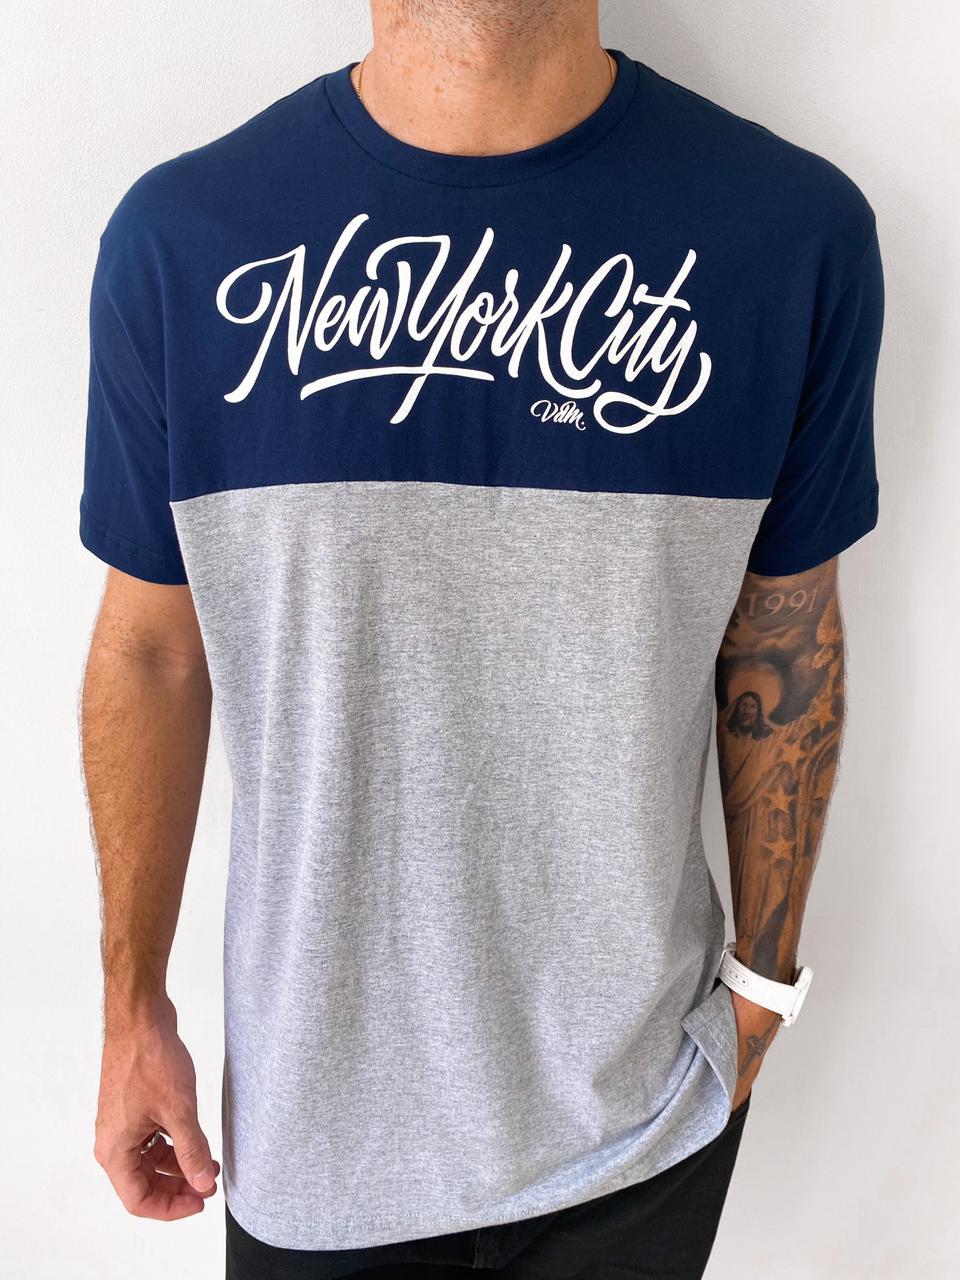 Long New York City